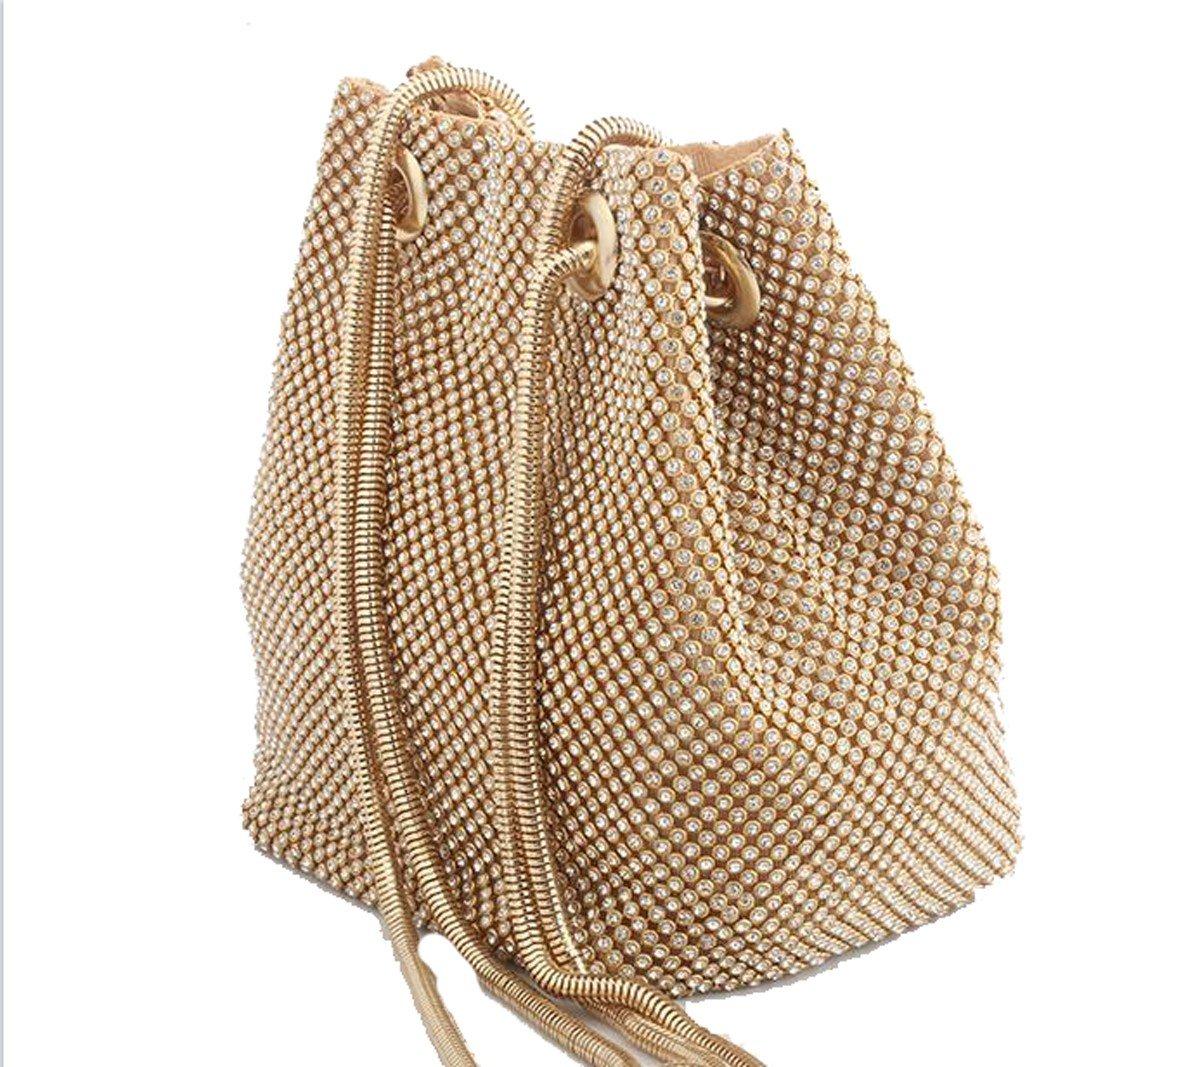 WFYJY-Trendige wanne Tasche Mini-Frau die Tasche